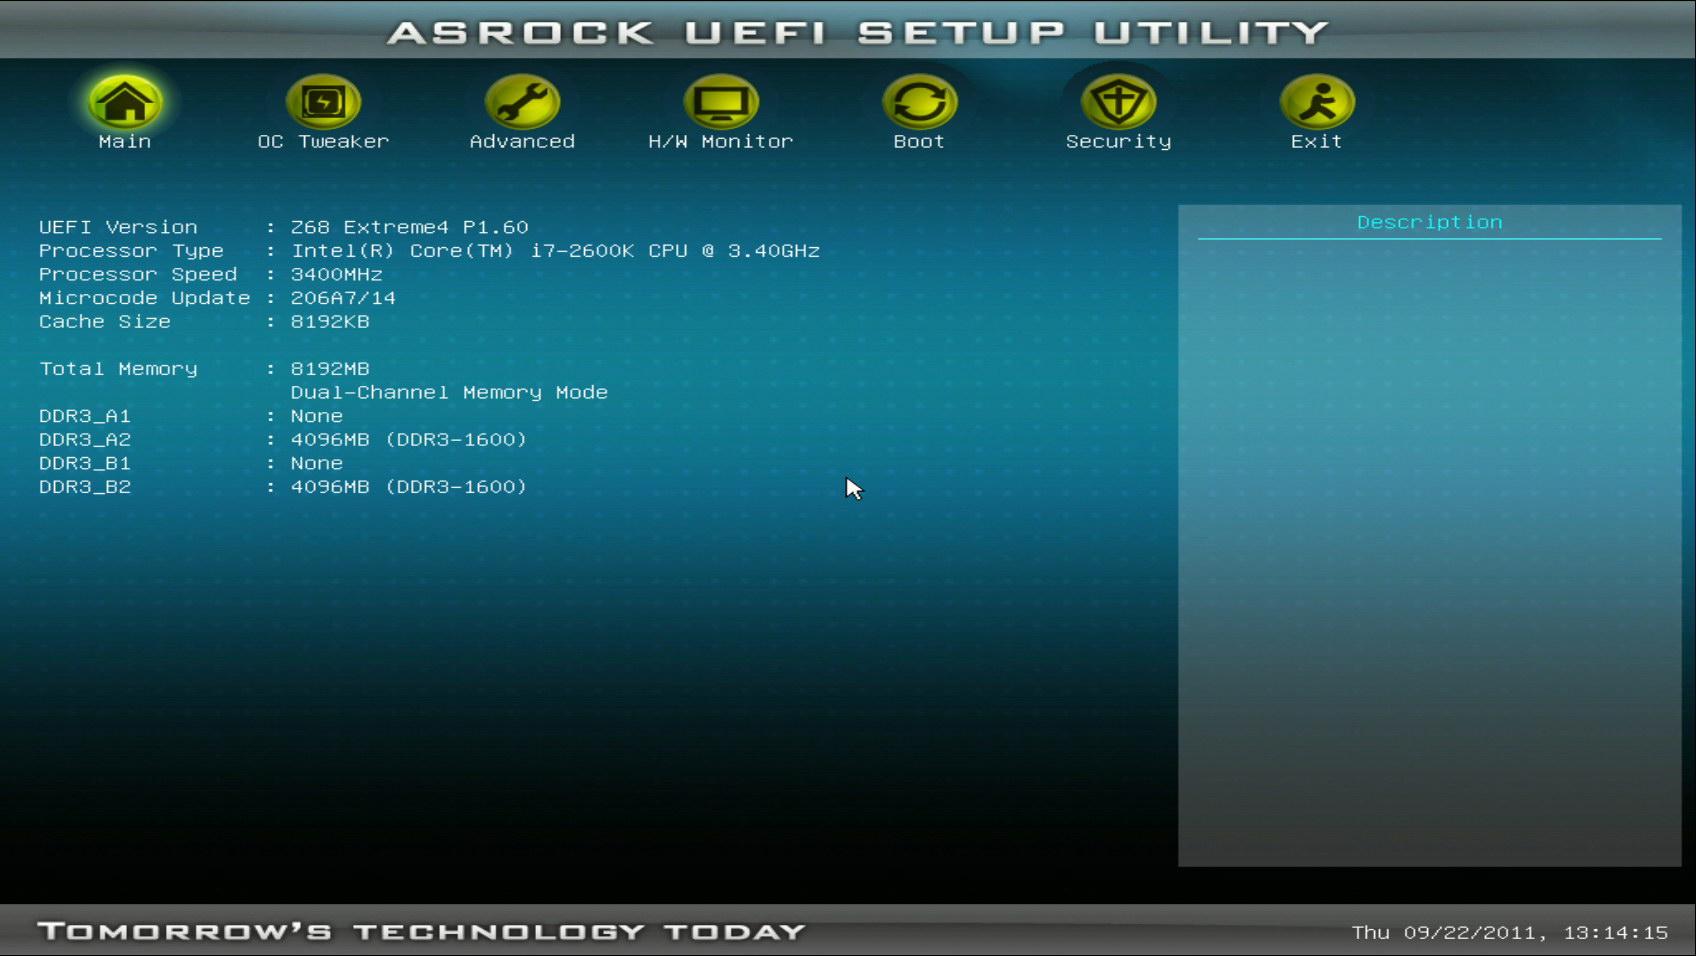 ASRock-UEFI-SETUP-UTILITY-BIOS-nastrojka.jpg